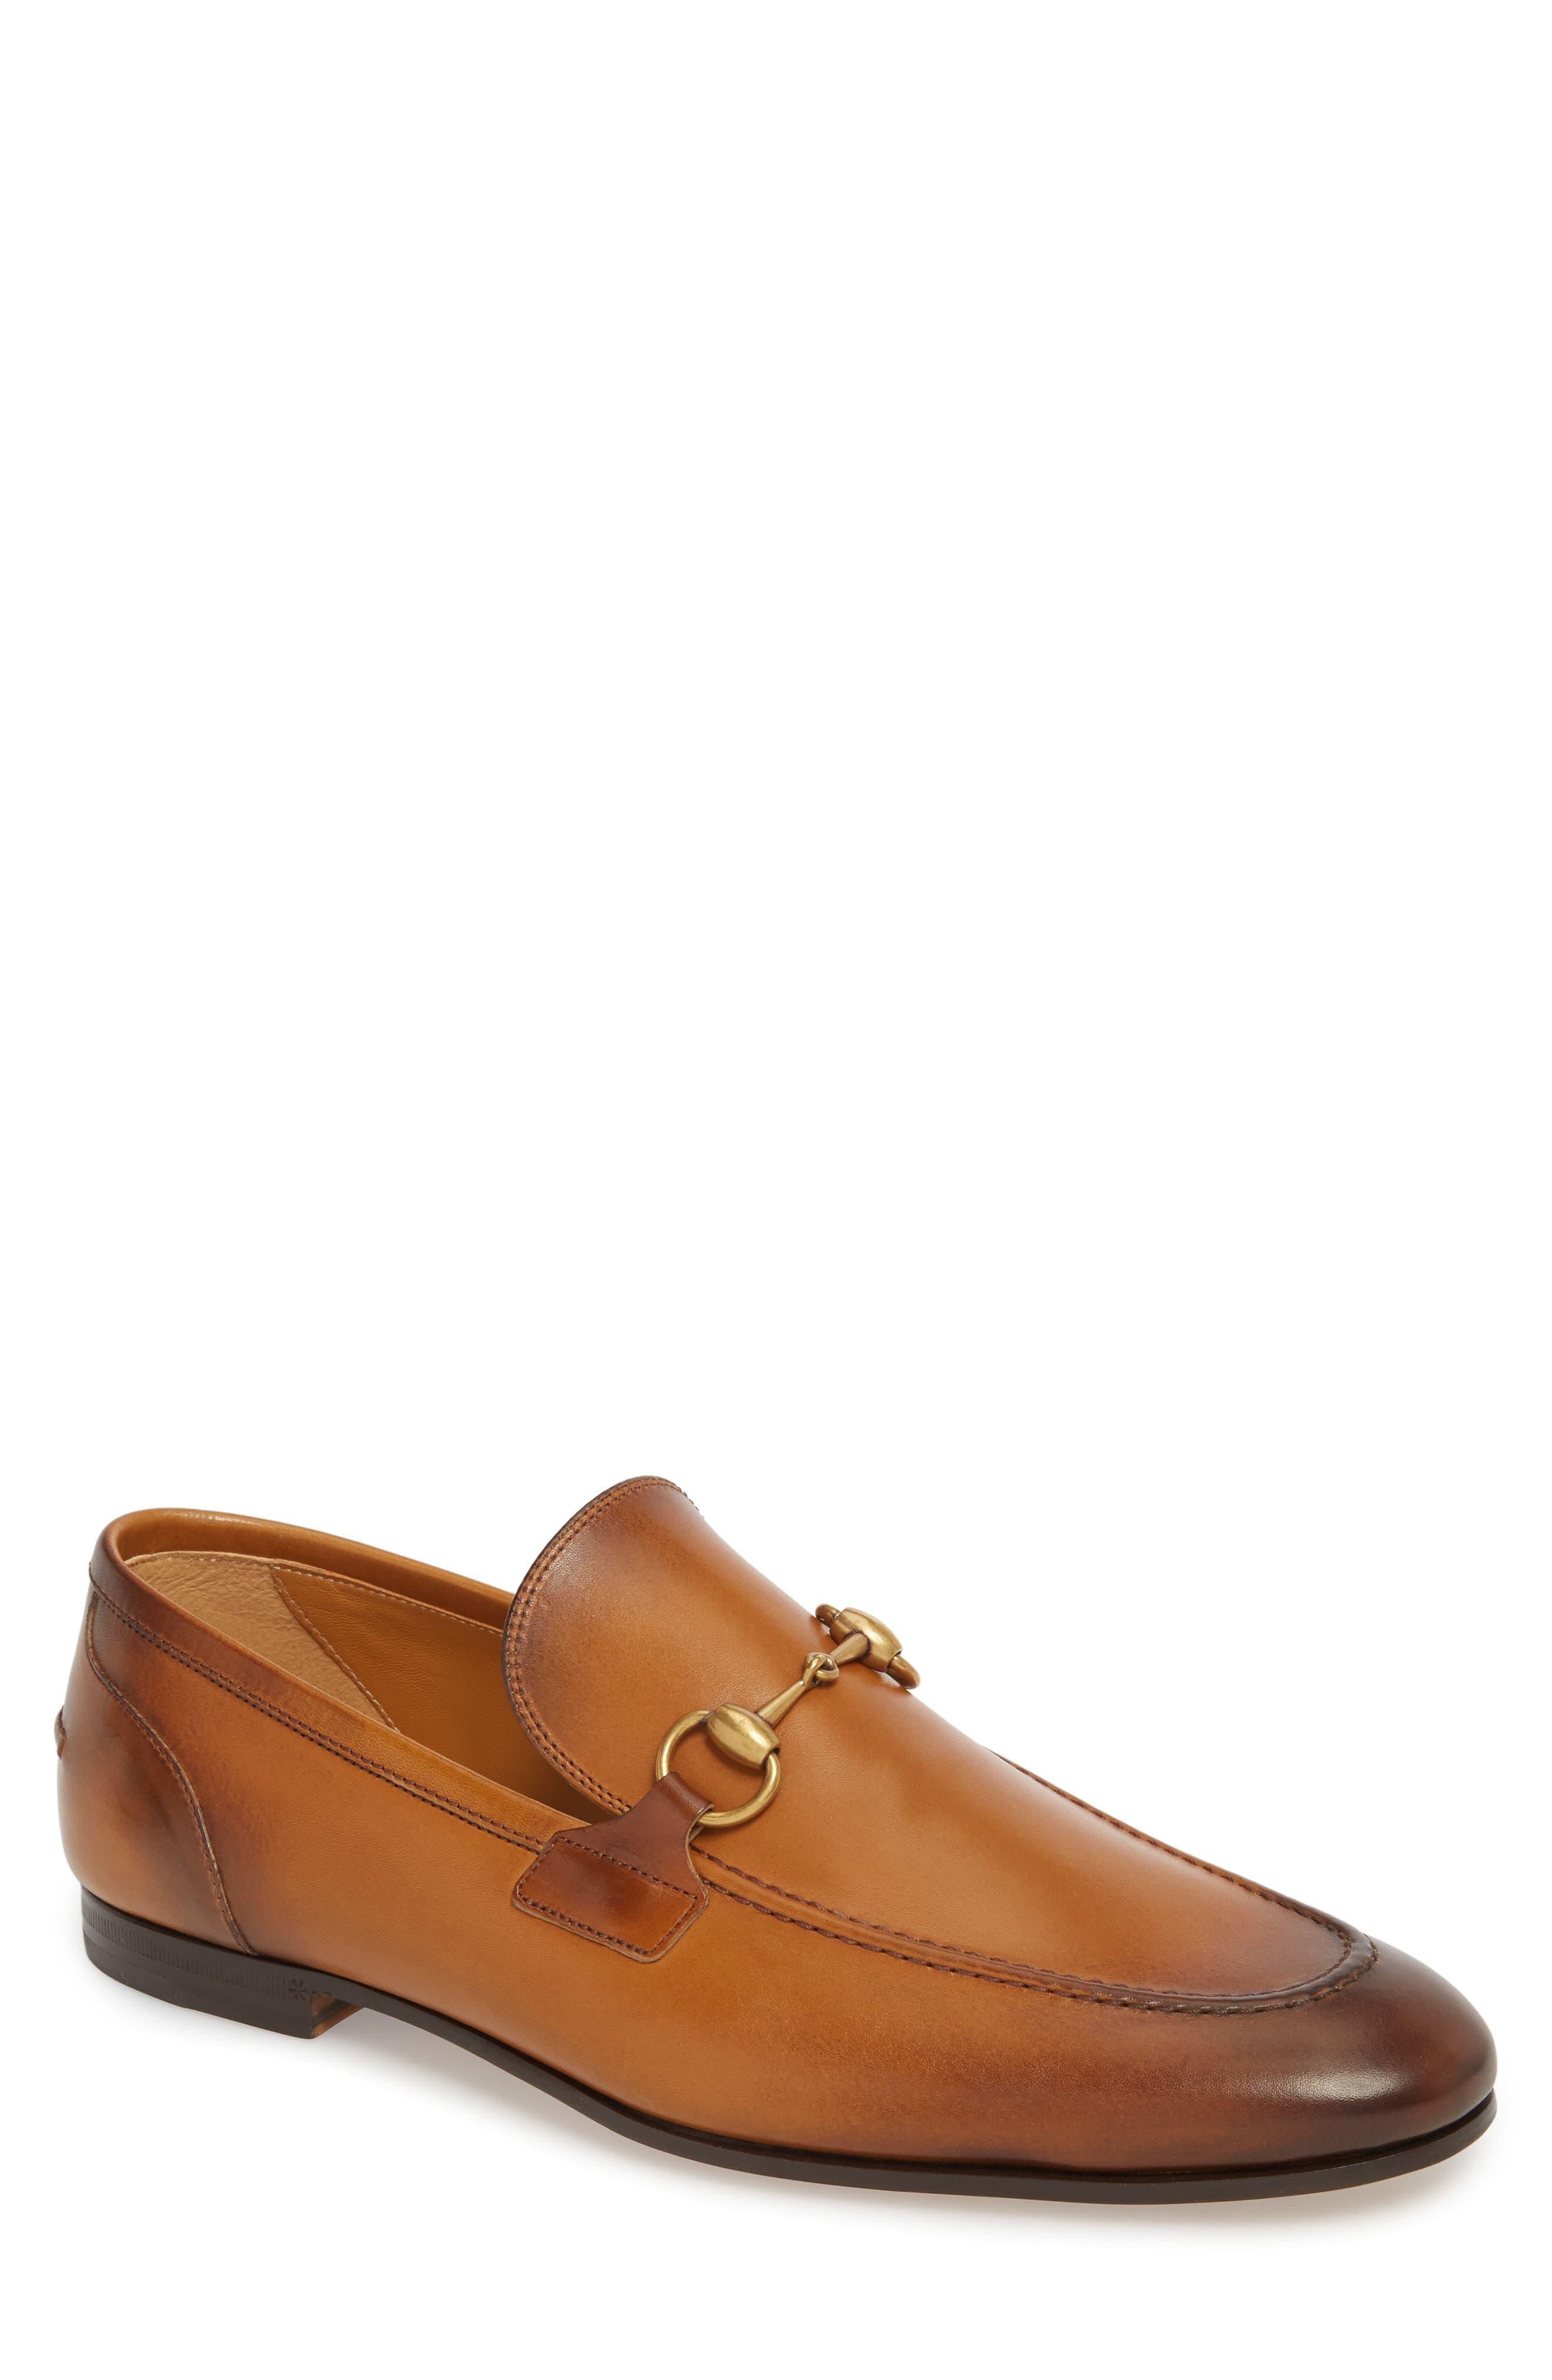 GUCCI Jordaan Bit Loafer, Main, color, BROWN